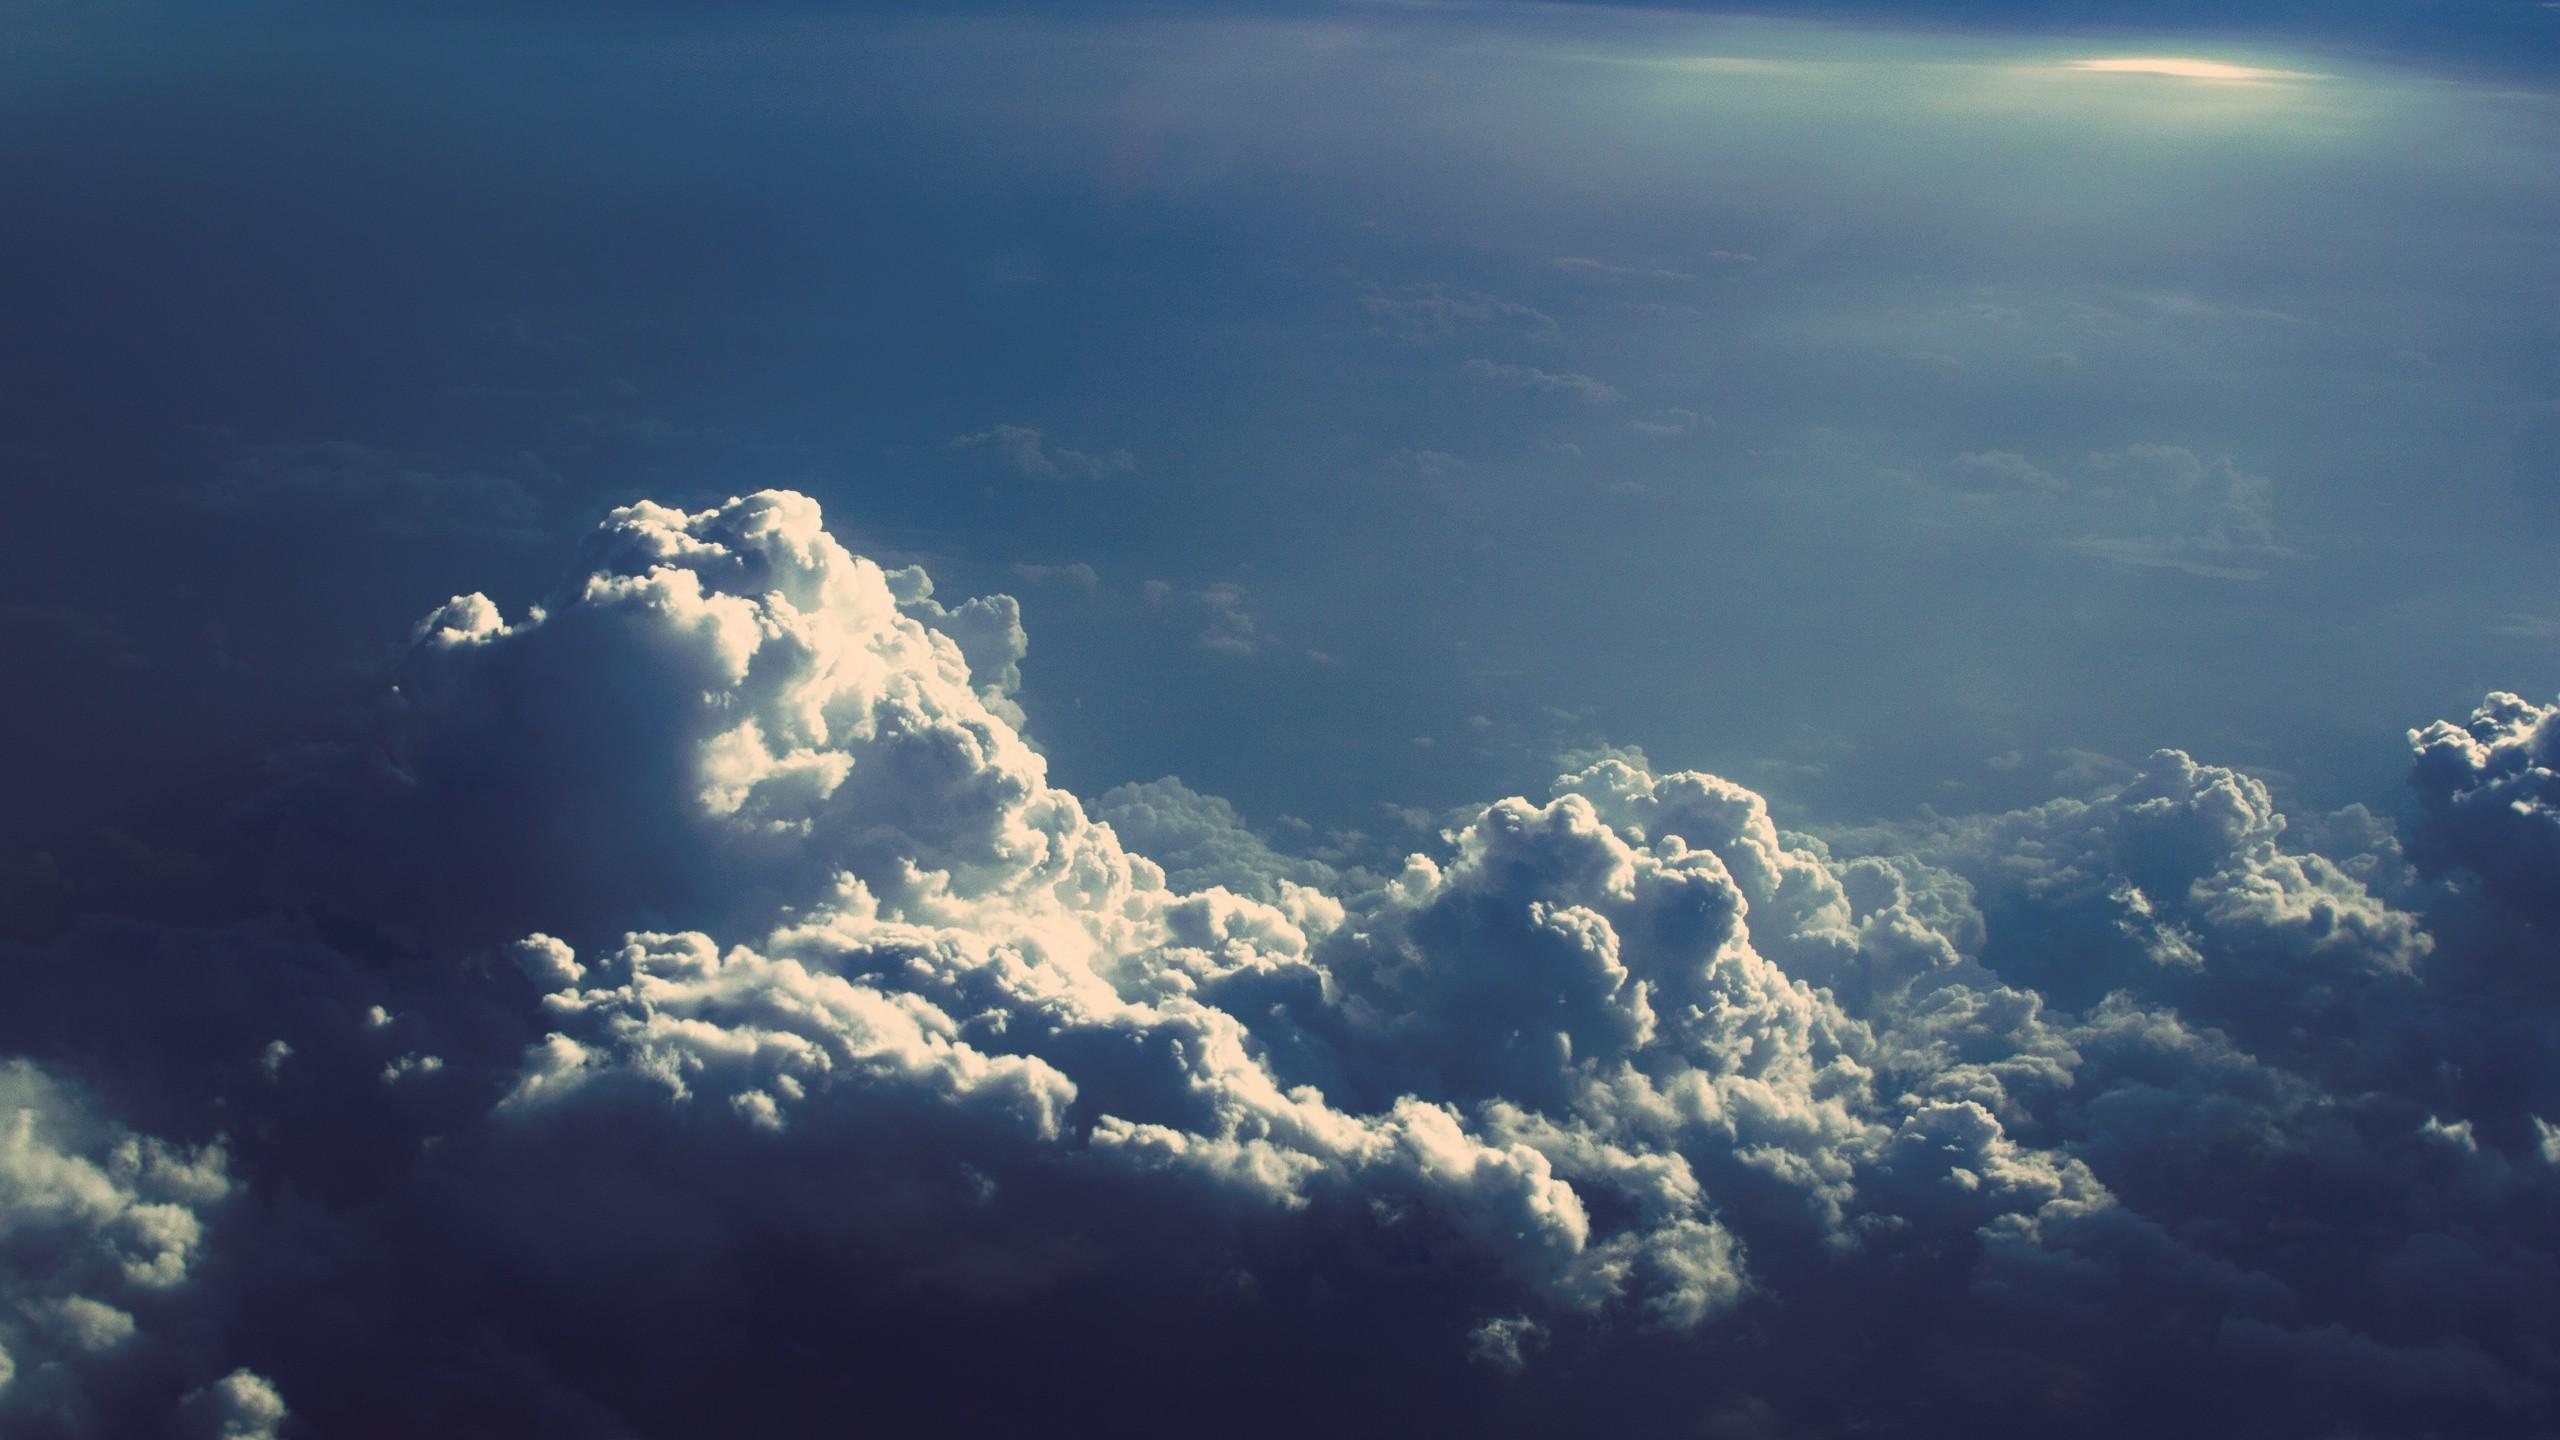 Clouds awesome wallpaper hd desktop wallpapers 4k hd for Cloud wallpaper